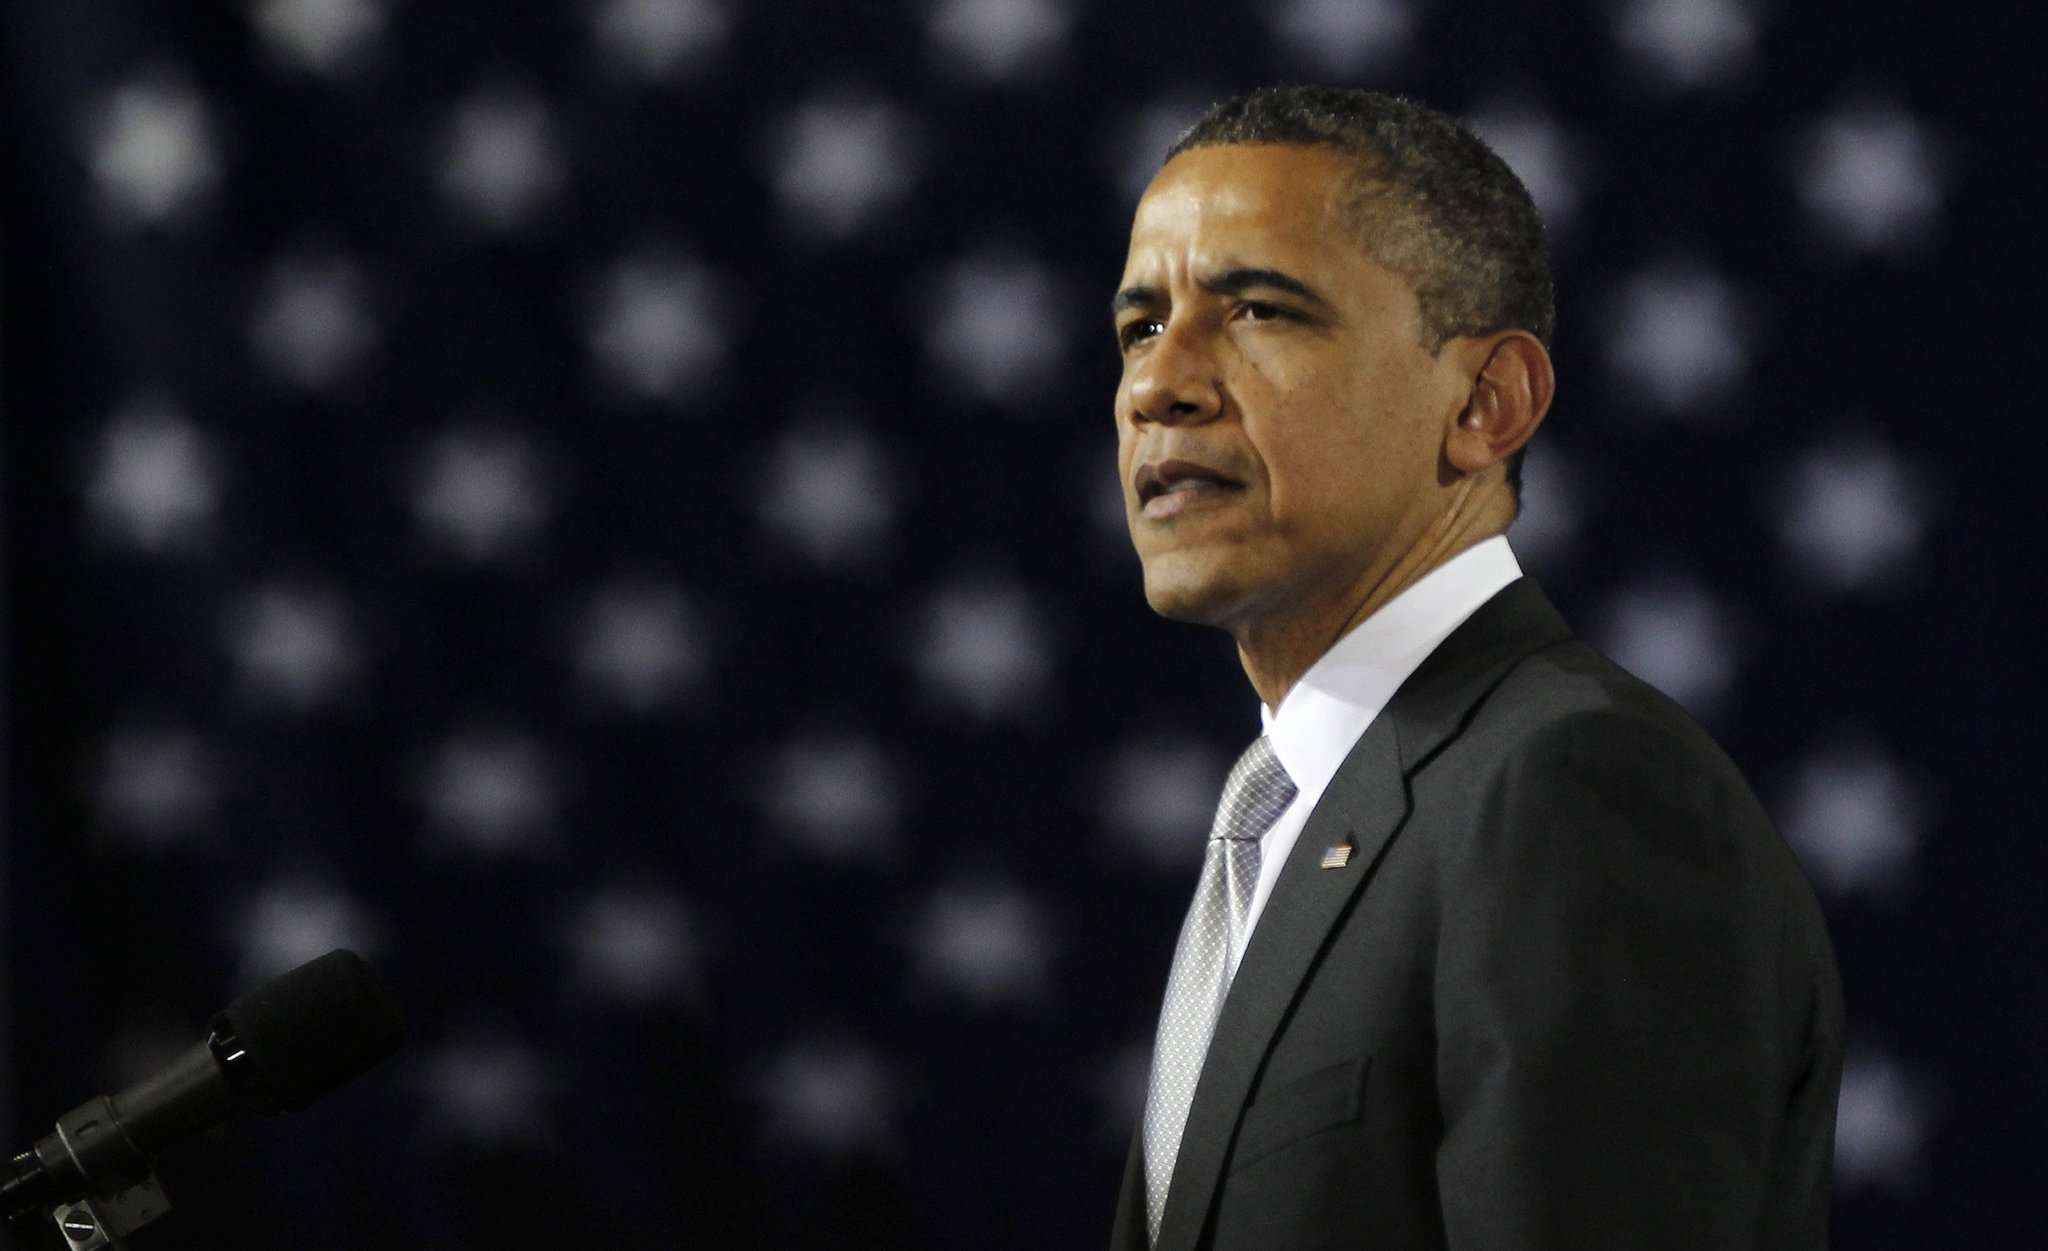 Inside President Obama's final Thanksgiving at the White House: https://t.co/SQ9RDou2Sx https://t.co/47mj8qortZ